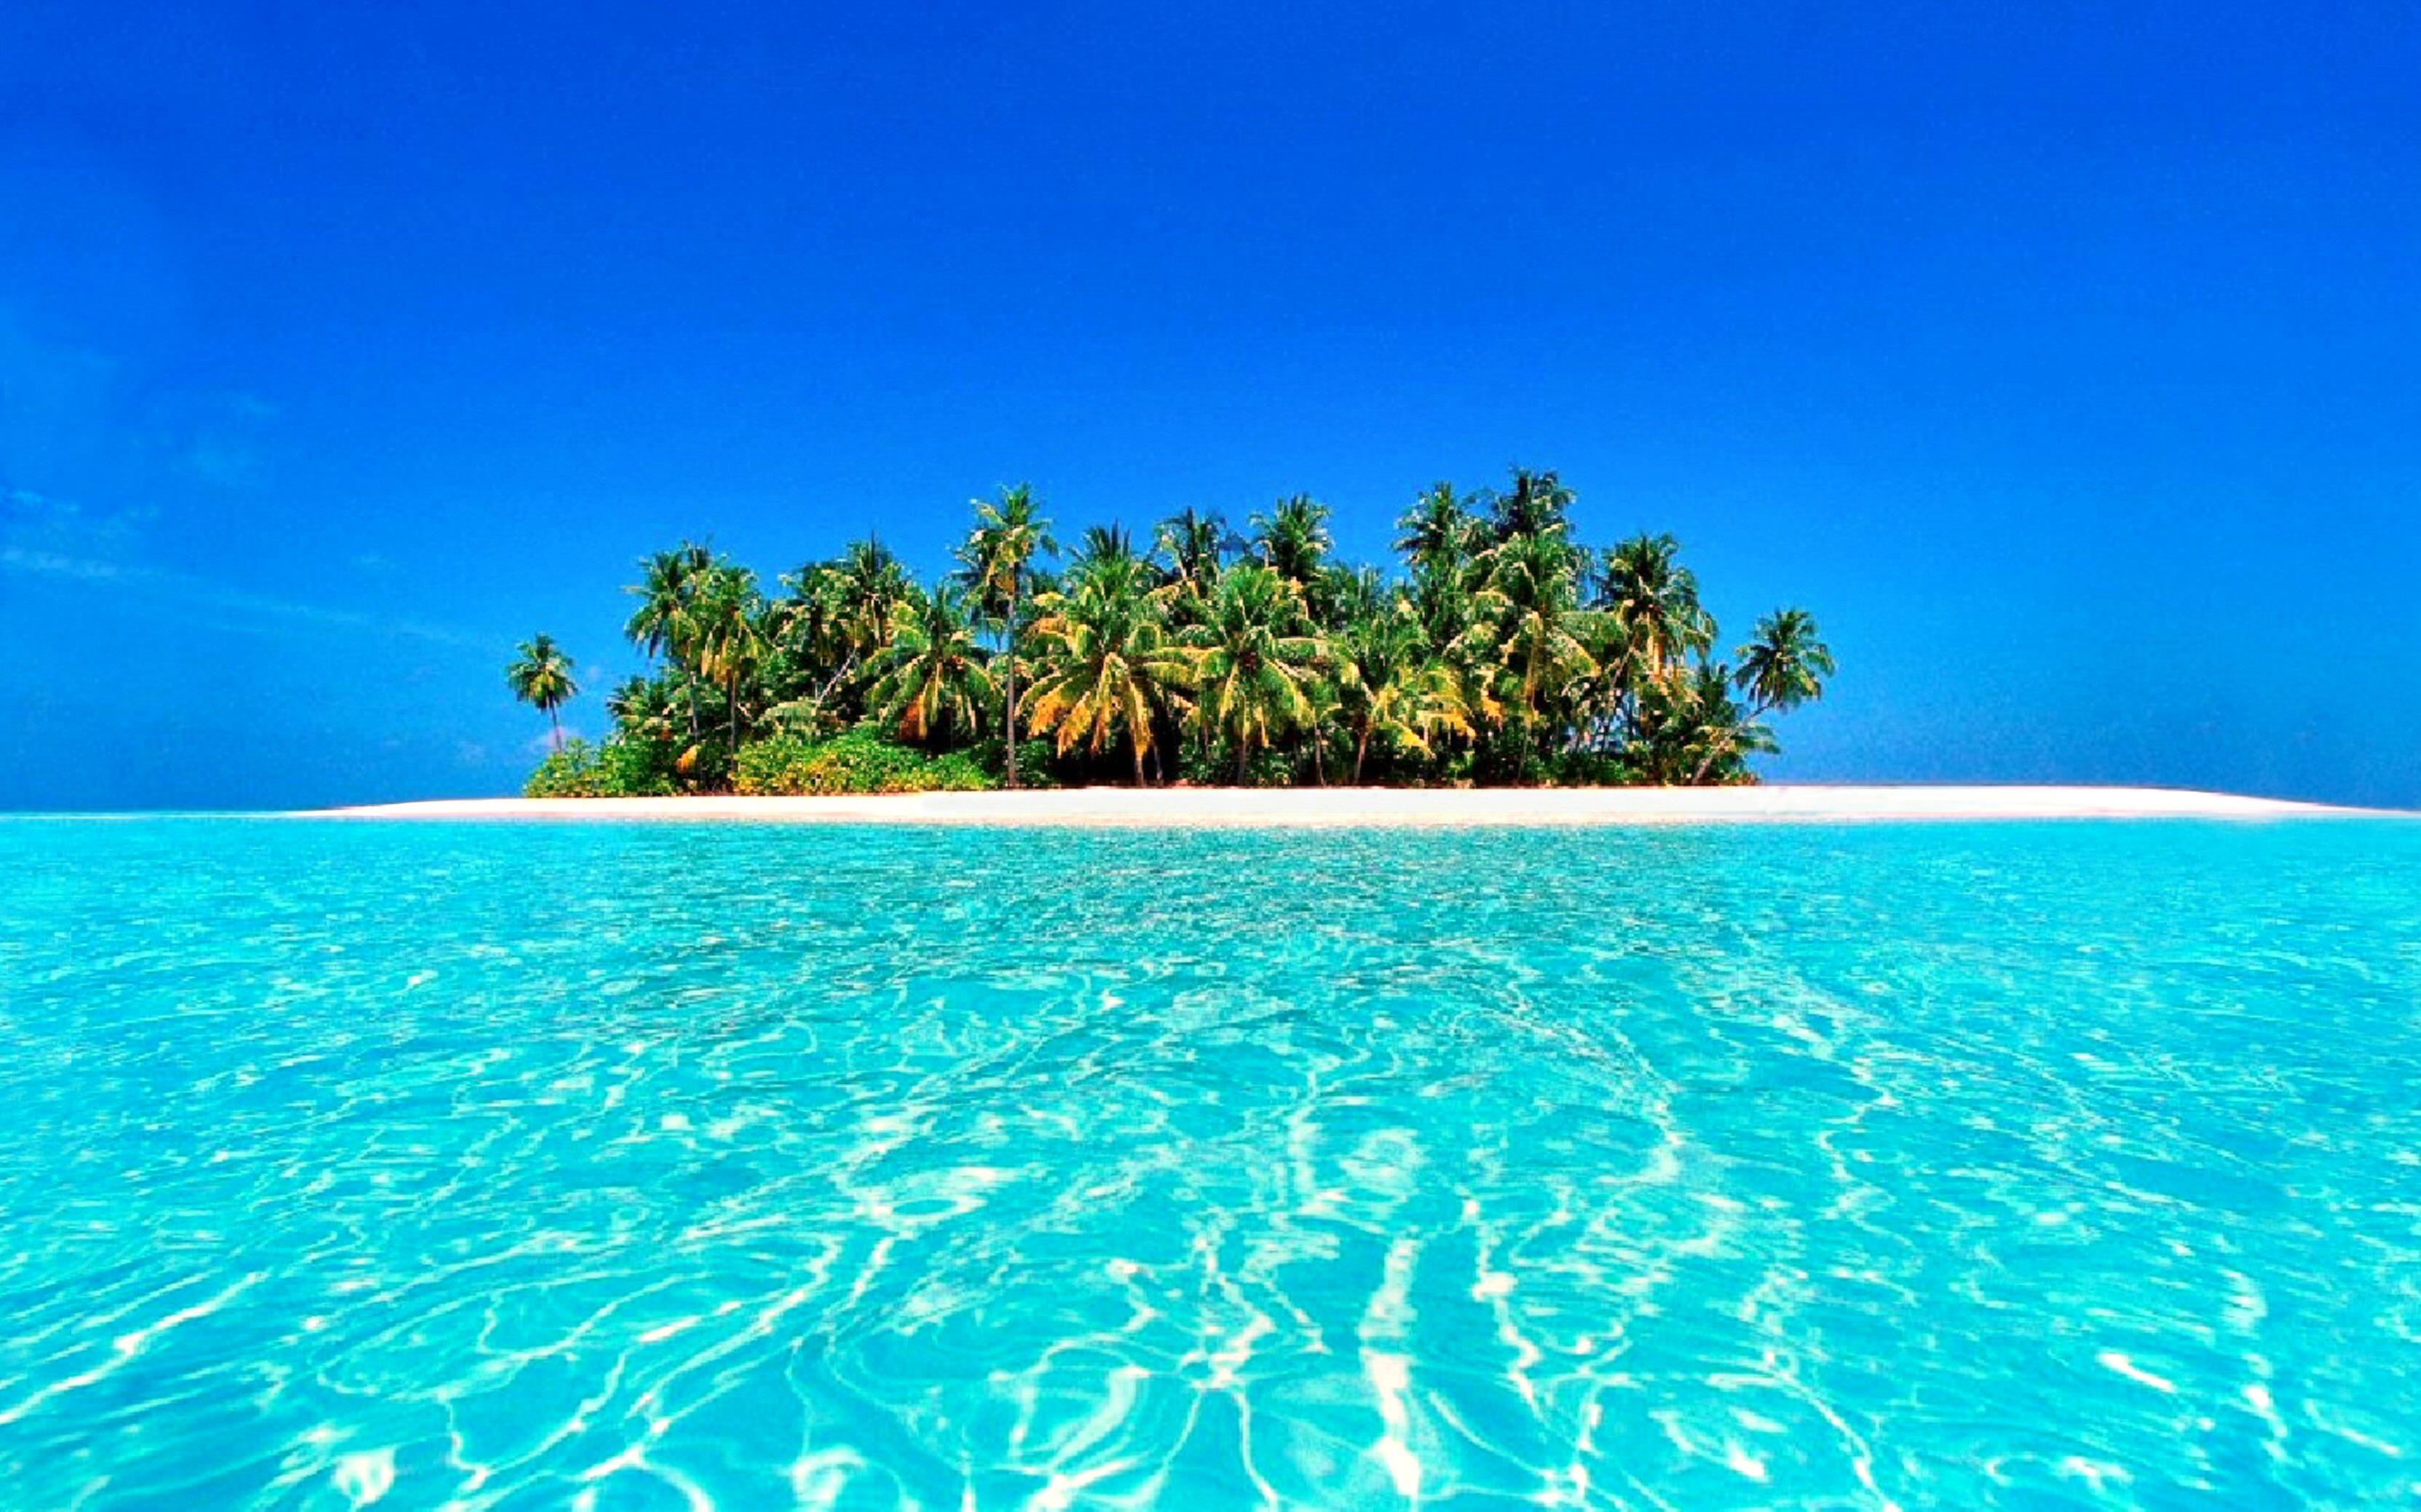 Tropical Paradise Wallpaper High Resolution: High Def Tropical Wallpaper